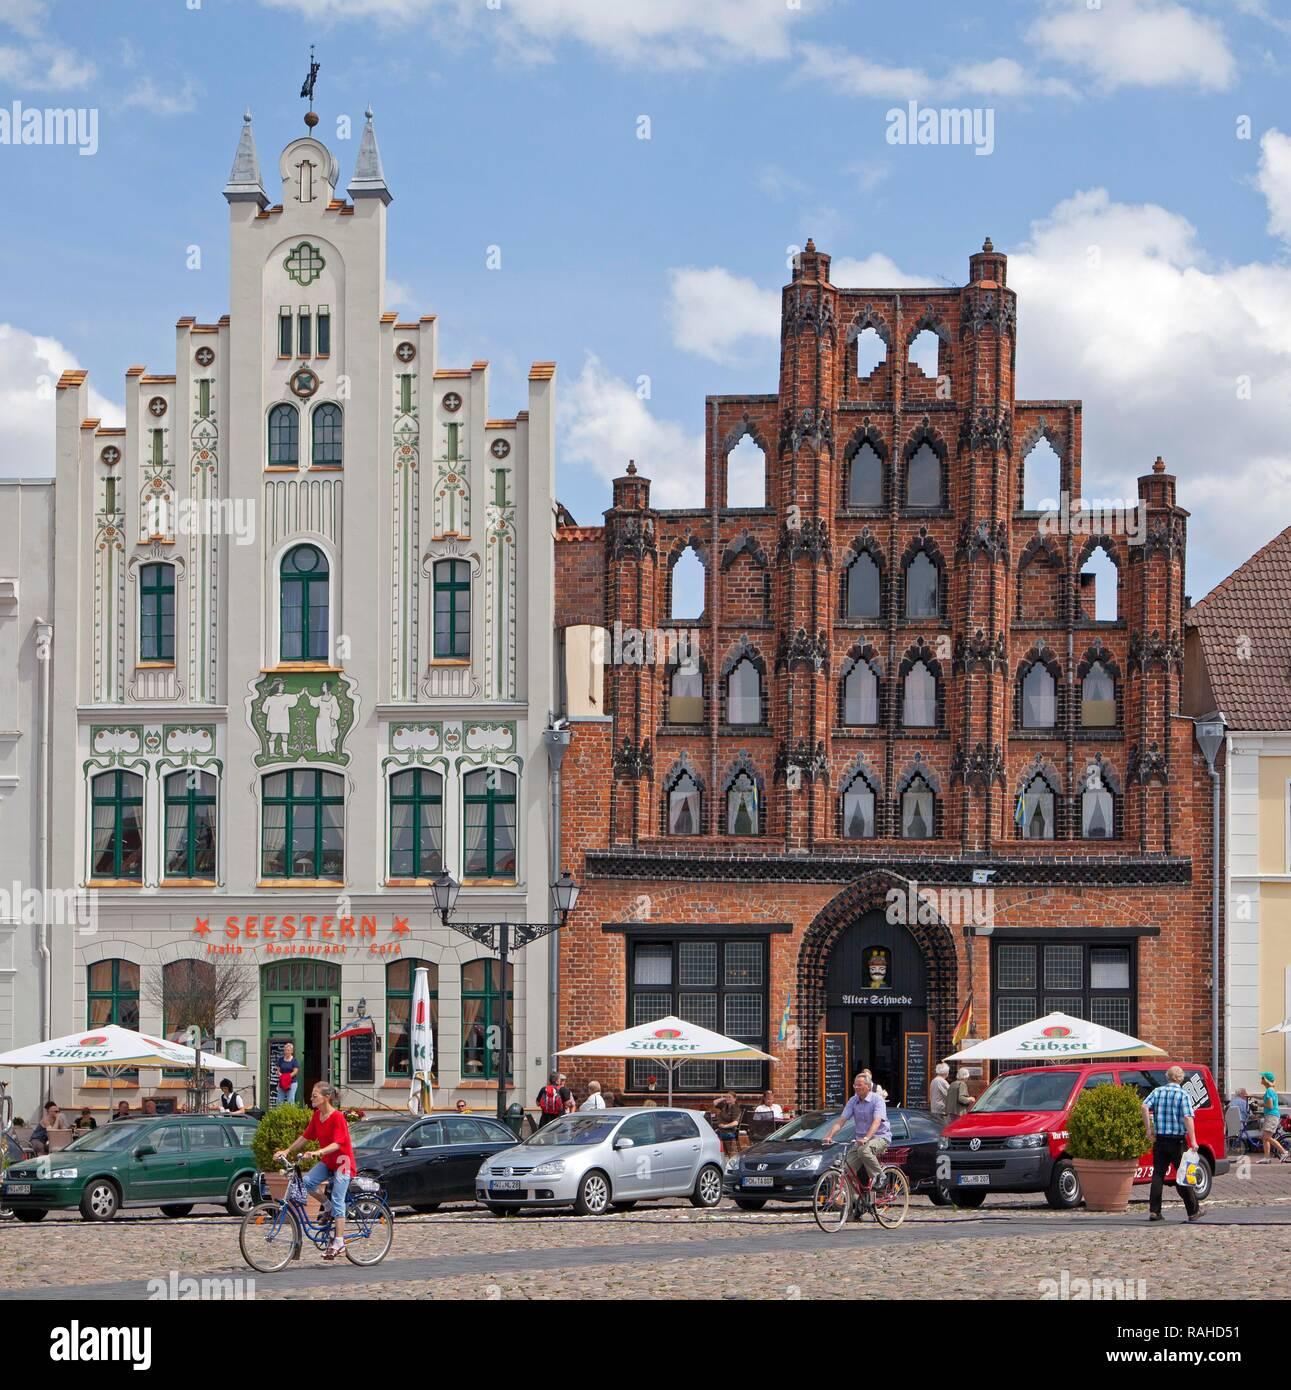 'Seestern' restaurant and 'Old Swede' warehouse, market square or market place, Wismar, Mecklenburg-Western Pomerania, Germany - Stock Image